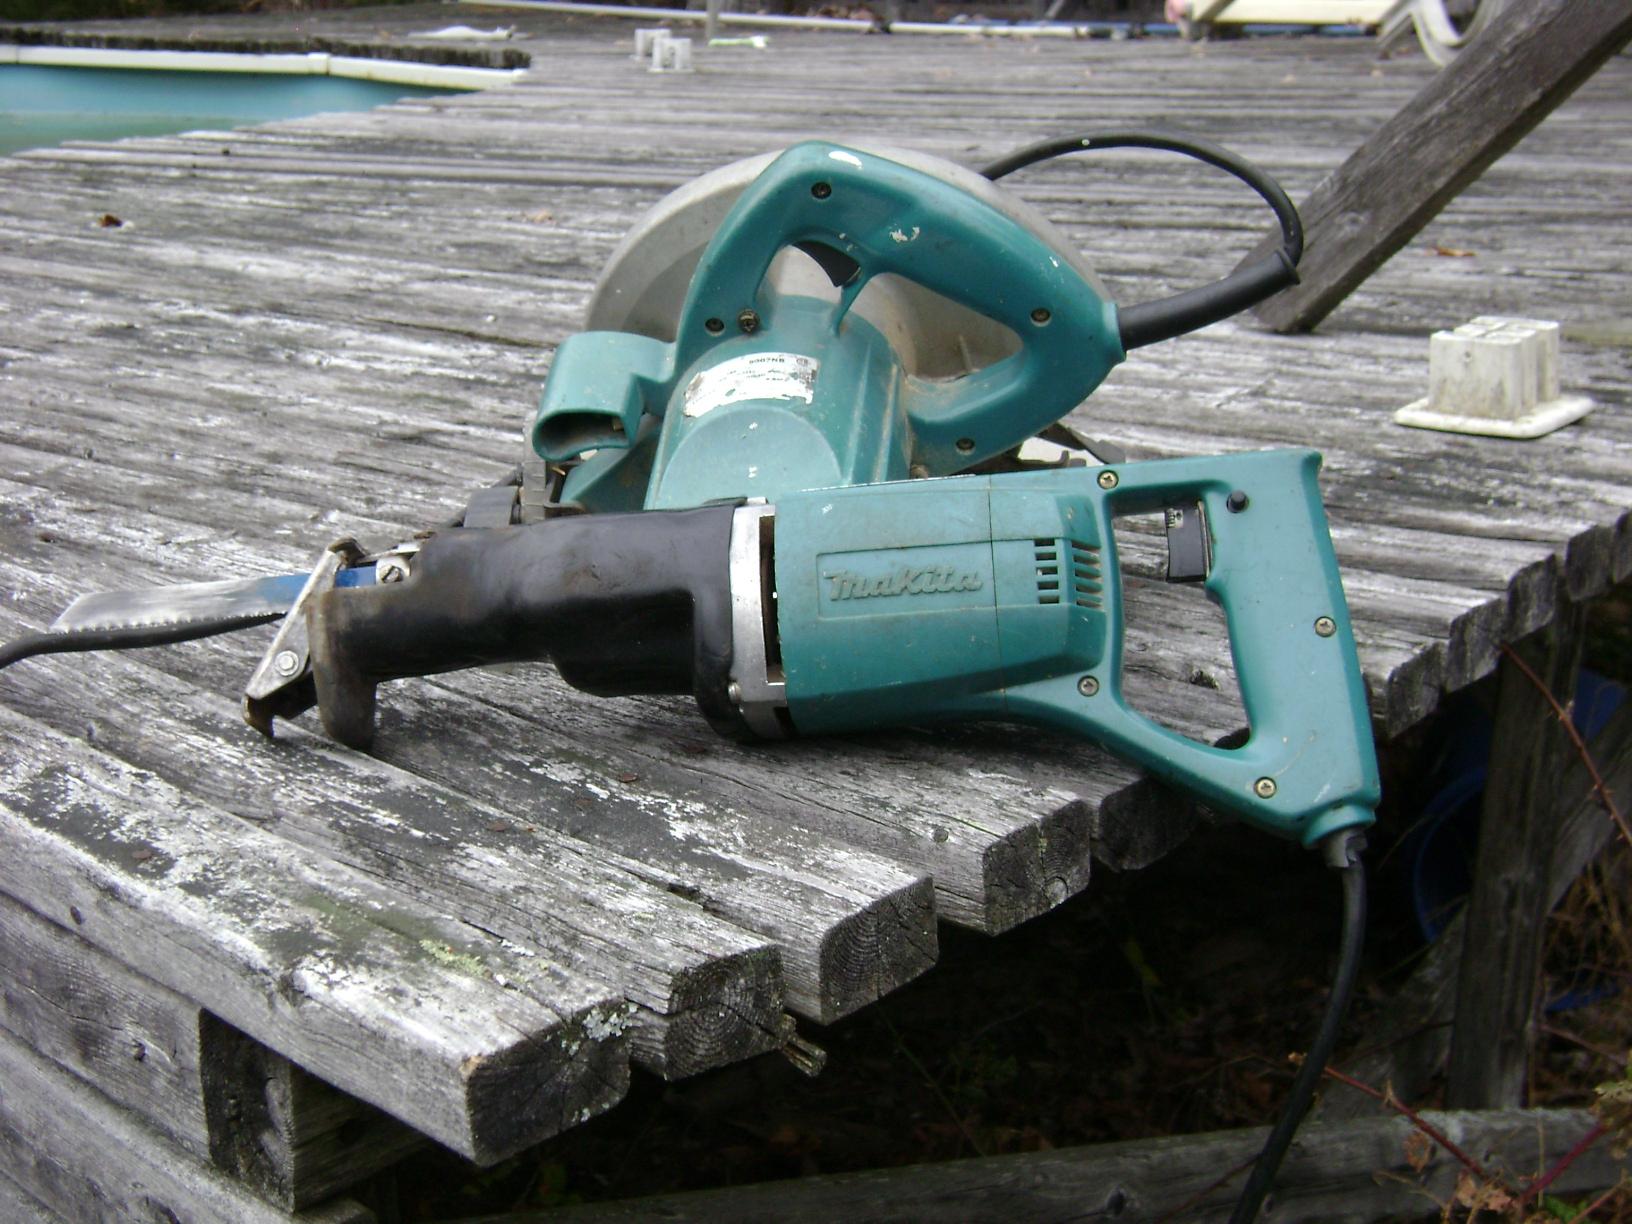 saws improvinghomevalue